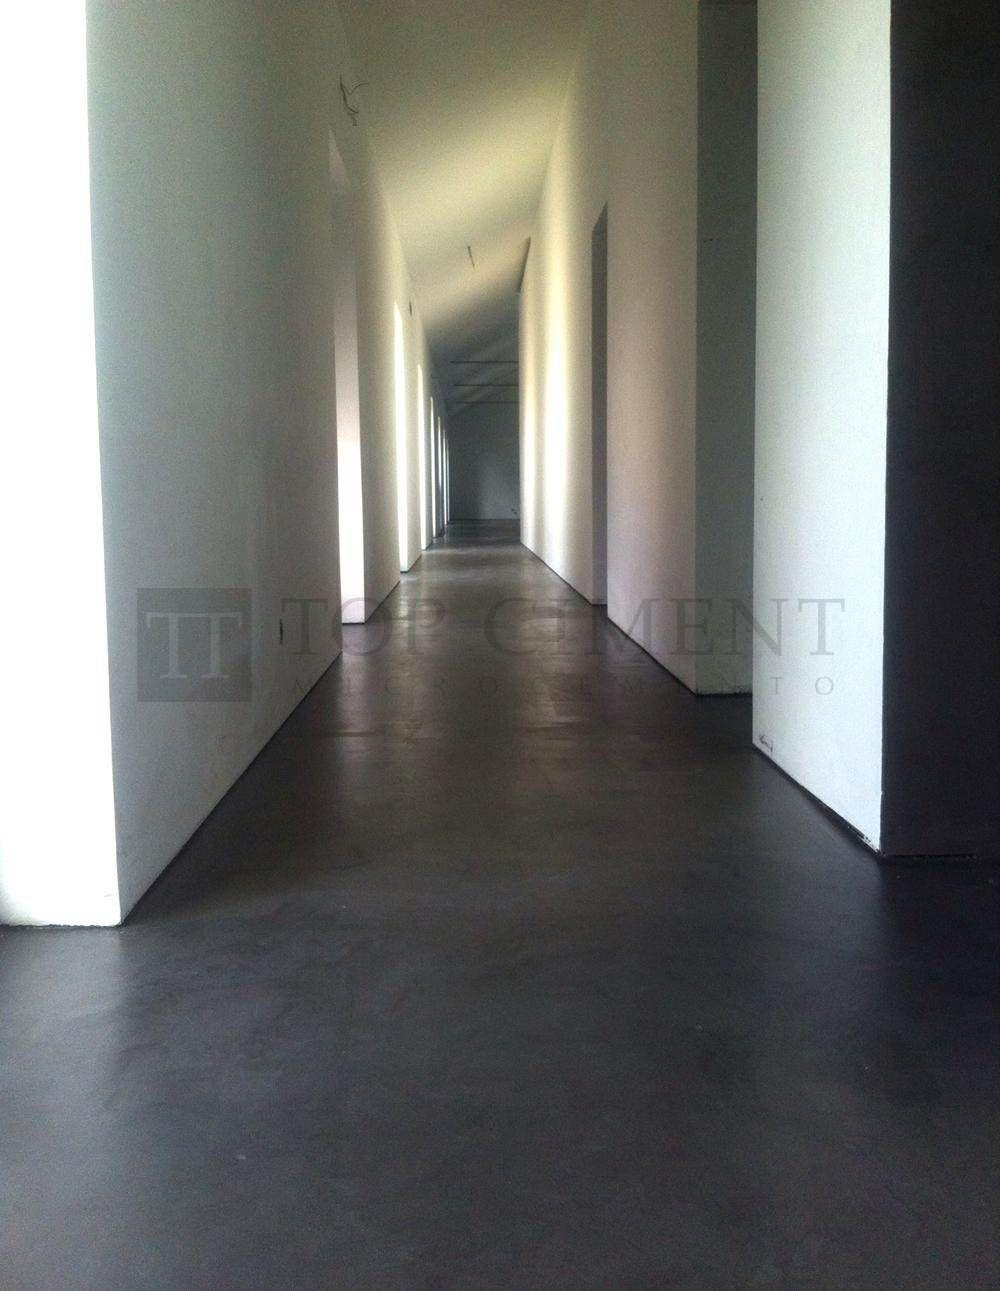 Suelo continuo en un pasillo de vivienda con microcemento - Suelos de microcemento ...